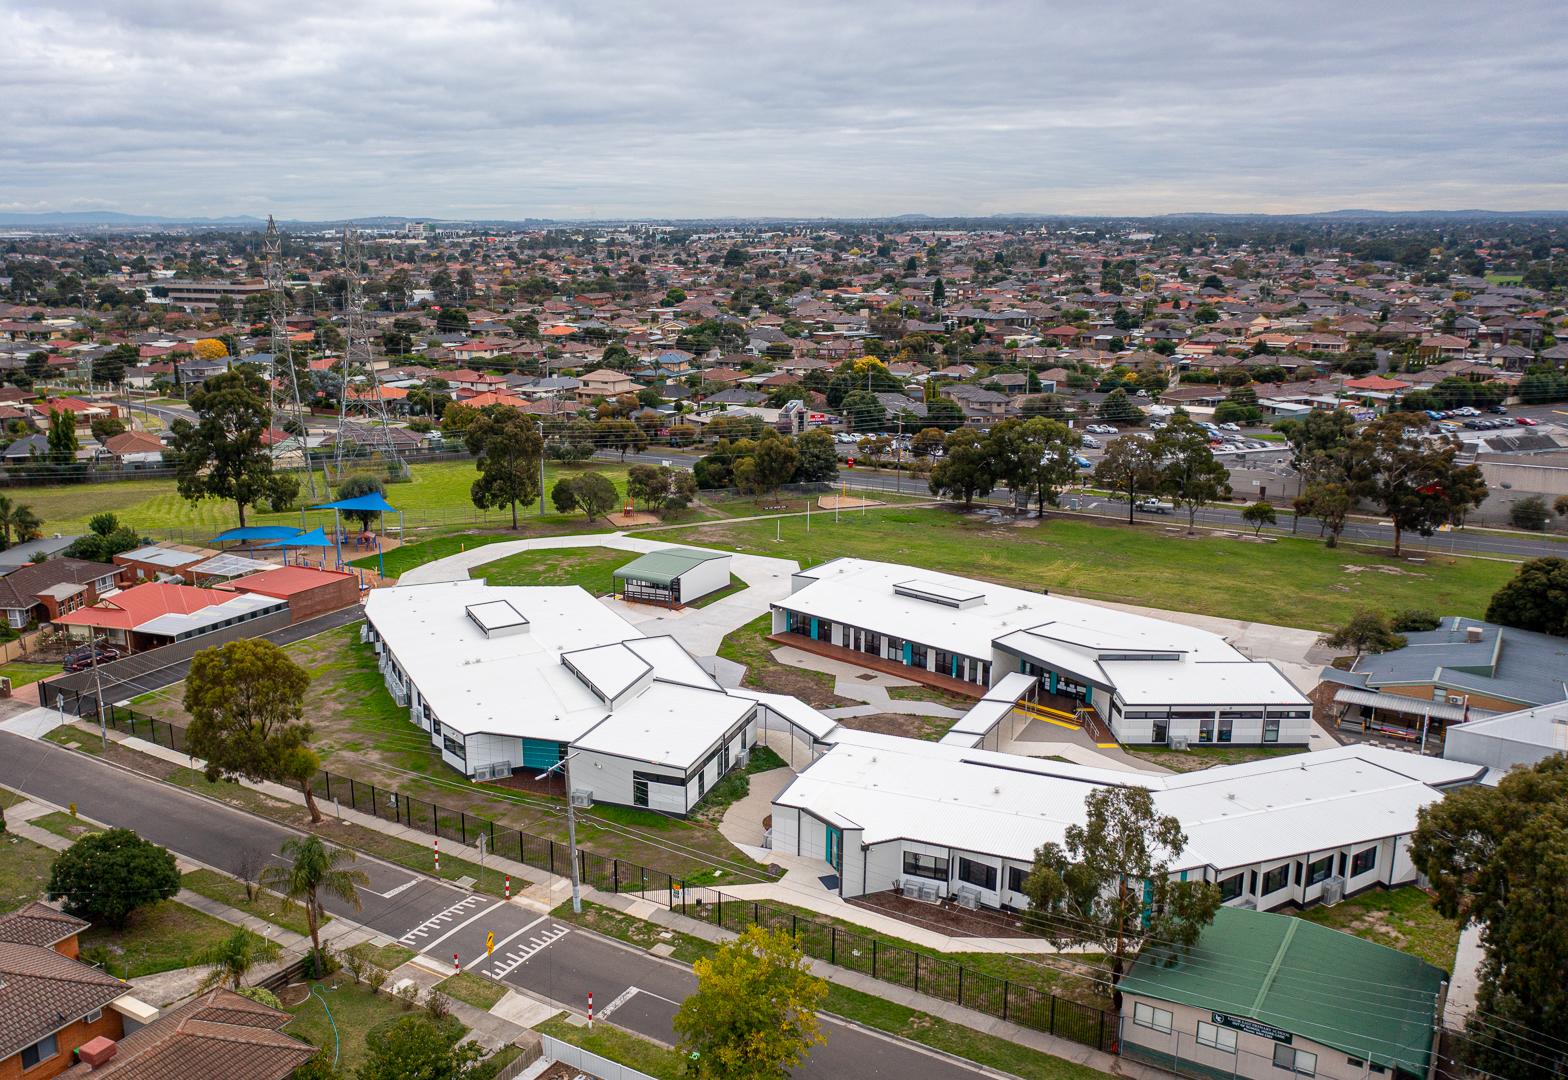 Lalor East Primary School